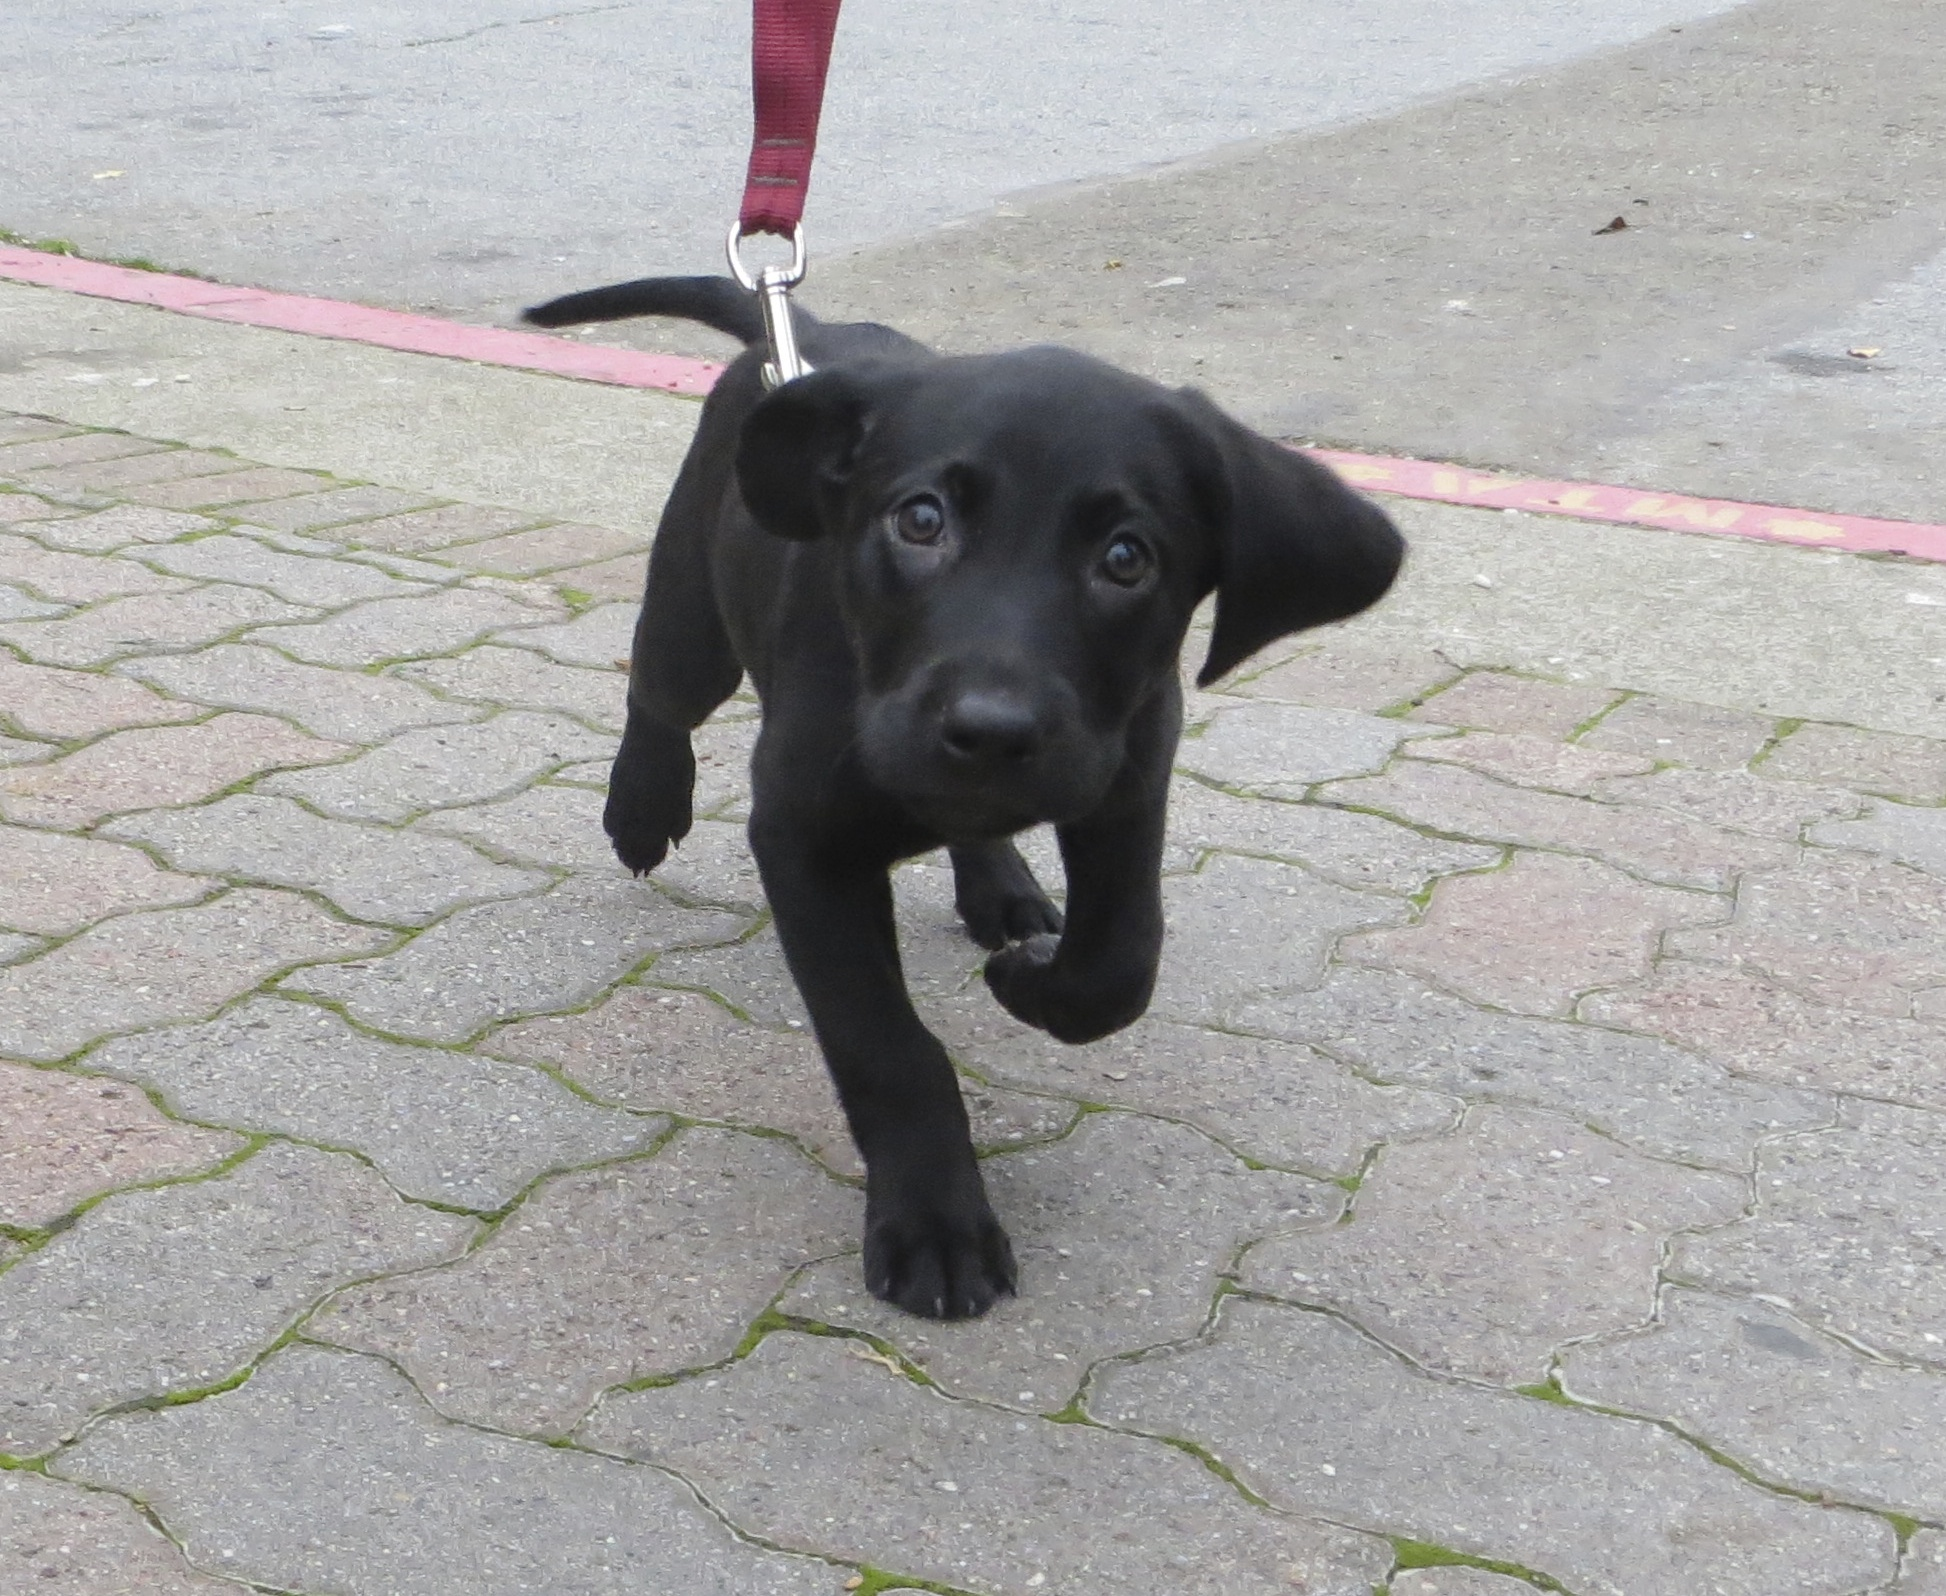 10-Week-Old Black Labrador Retriever Puppy